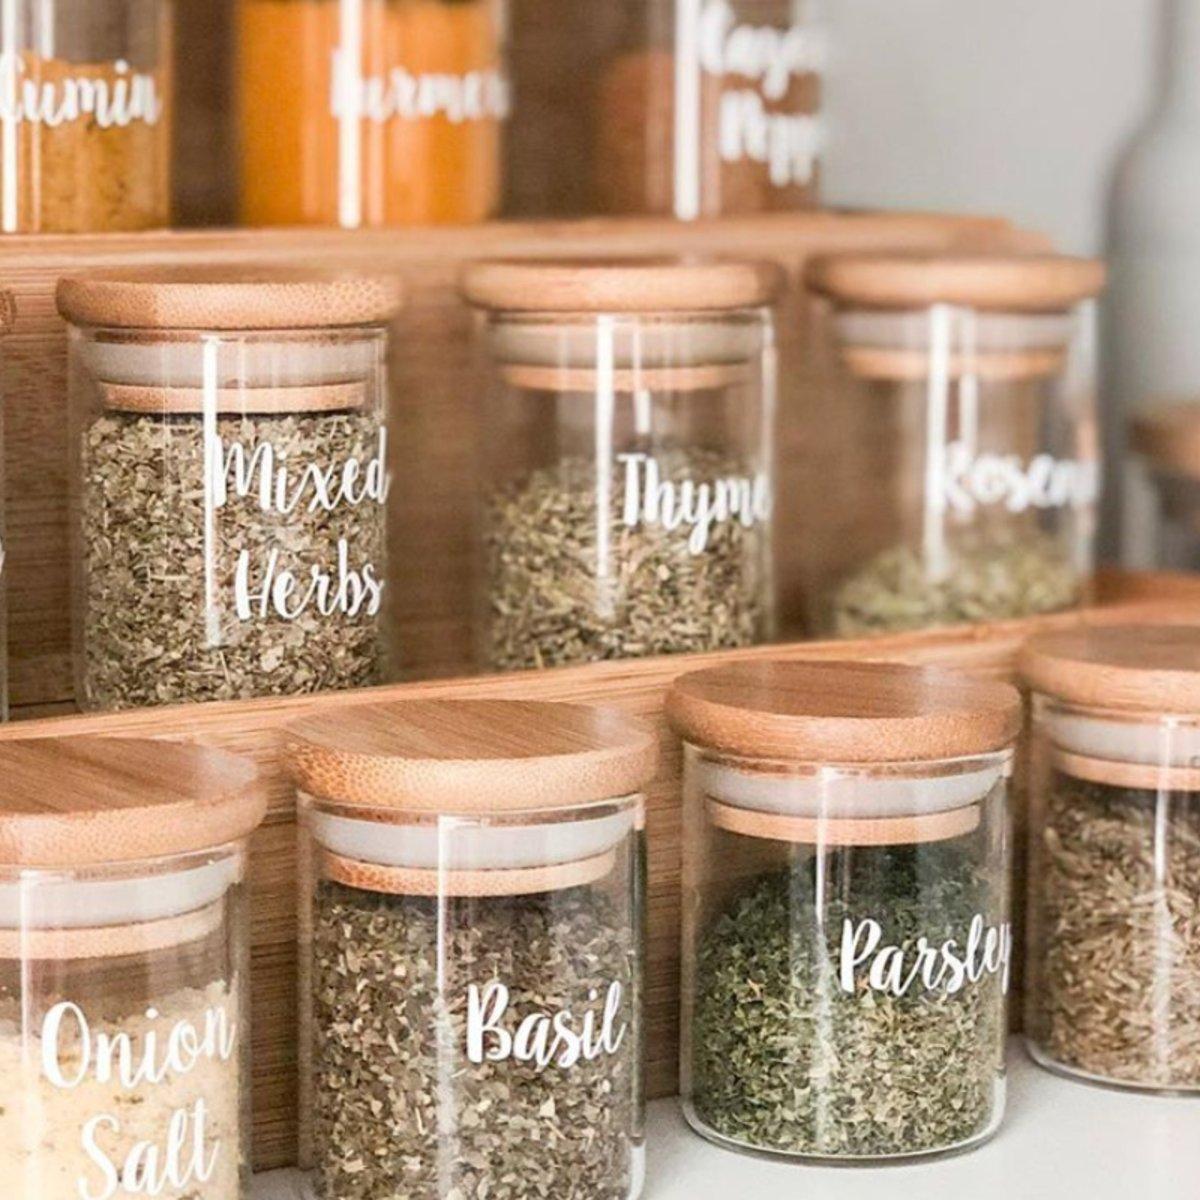 The 36 Diy Kmart Wooden Spice Rack Hack Organisers Love